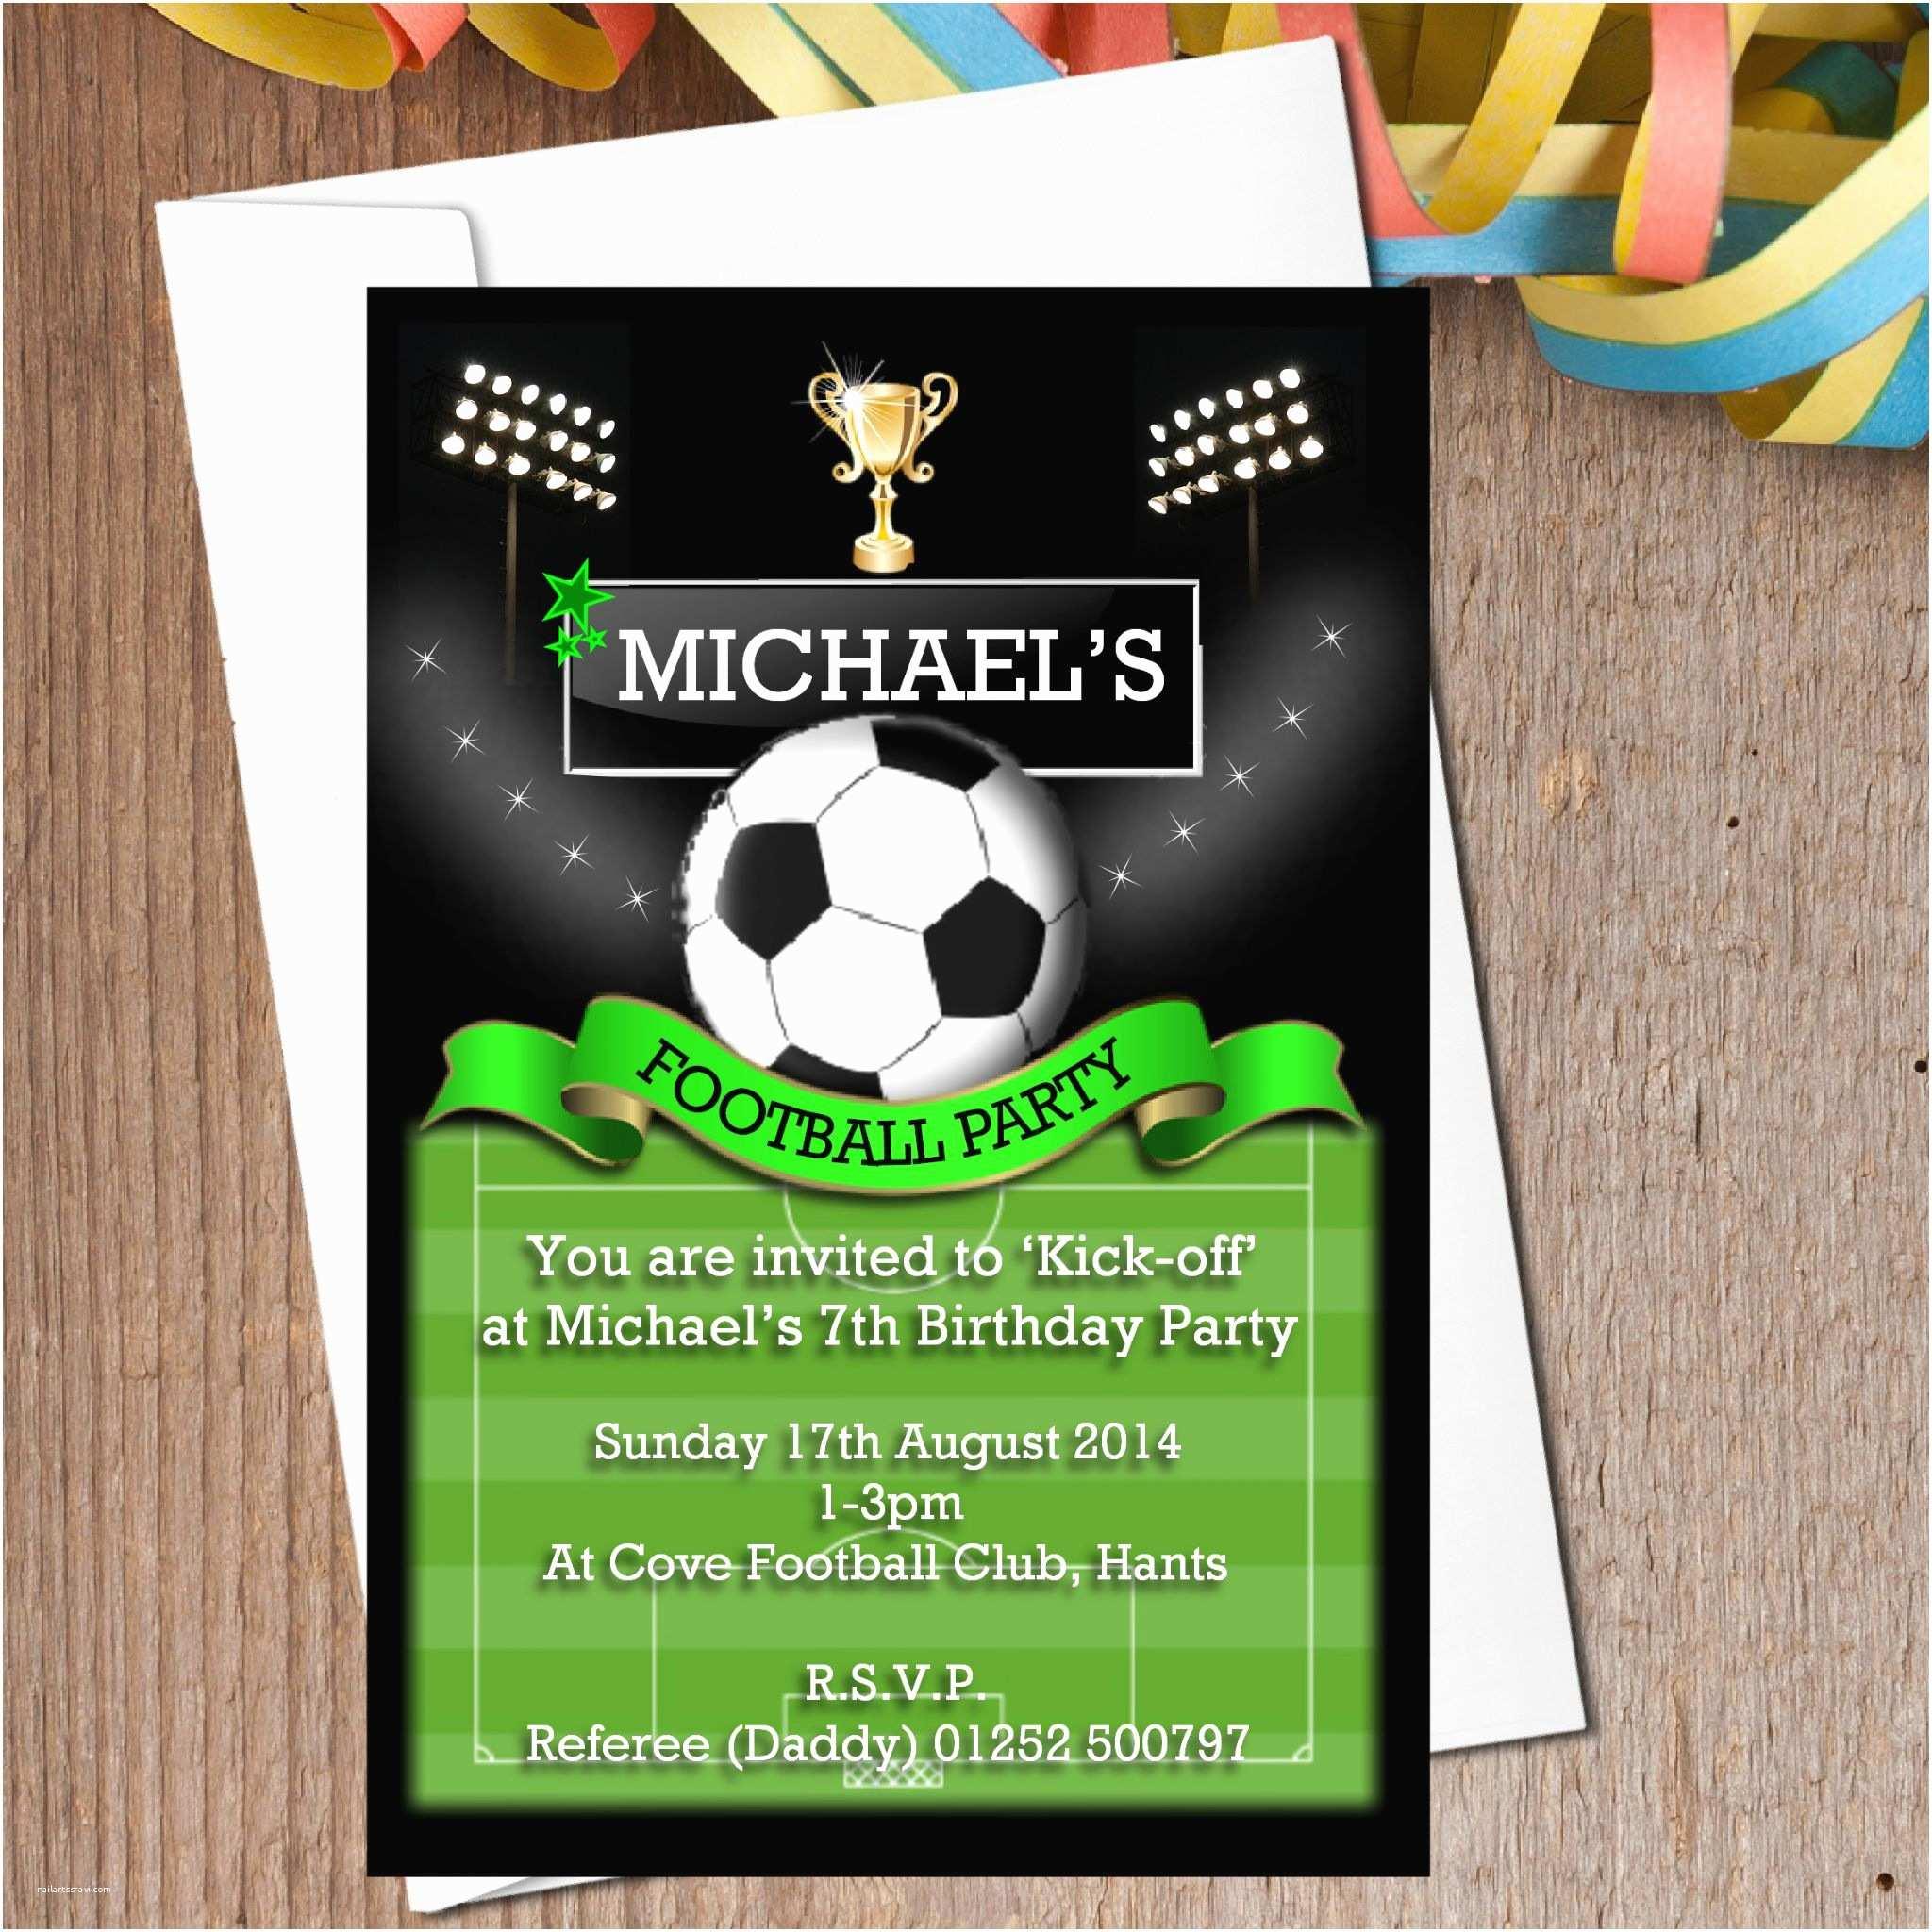 Soccer Birthday Invitations 11 Fearsome Football Birthday Party Invitations